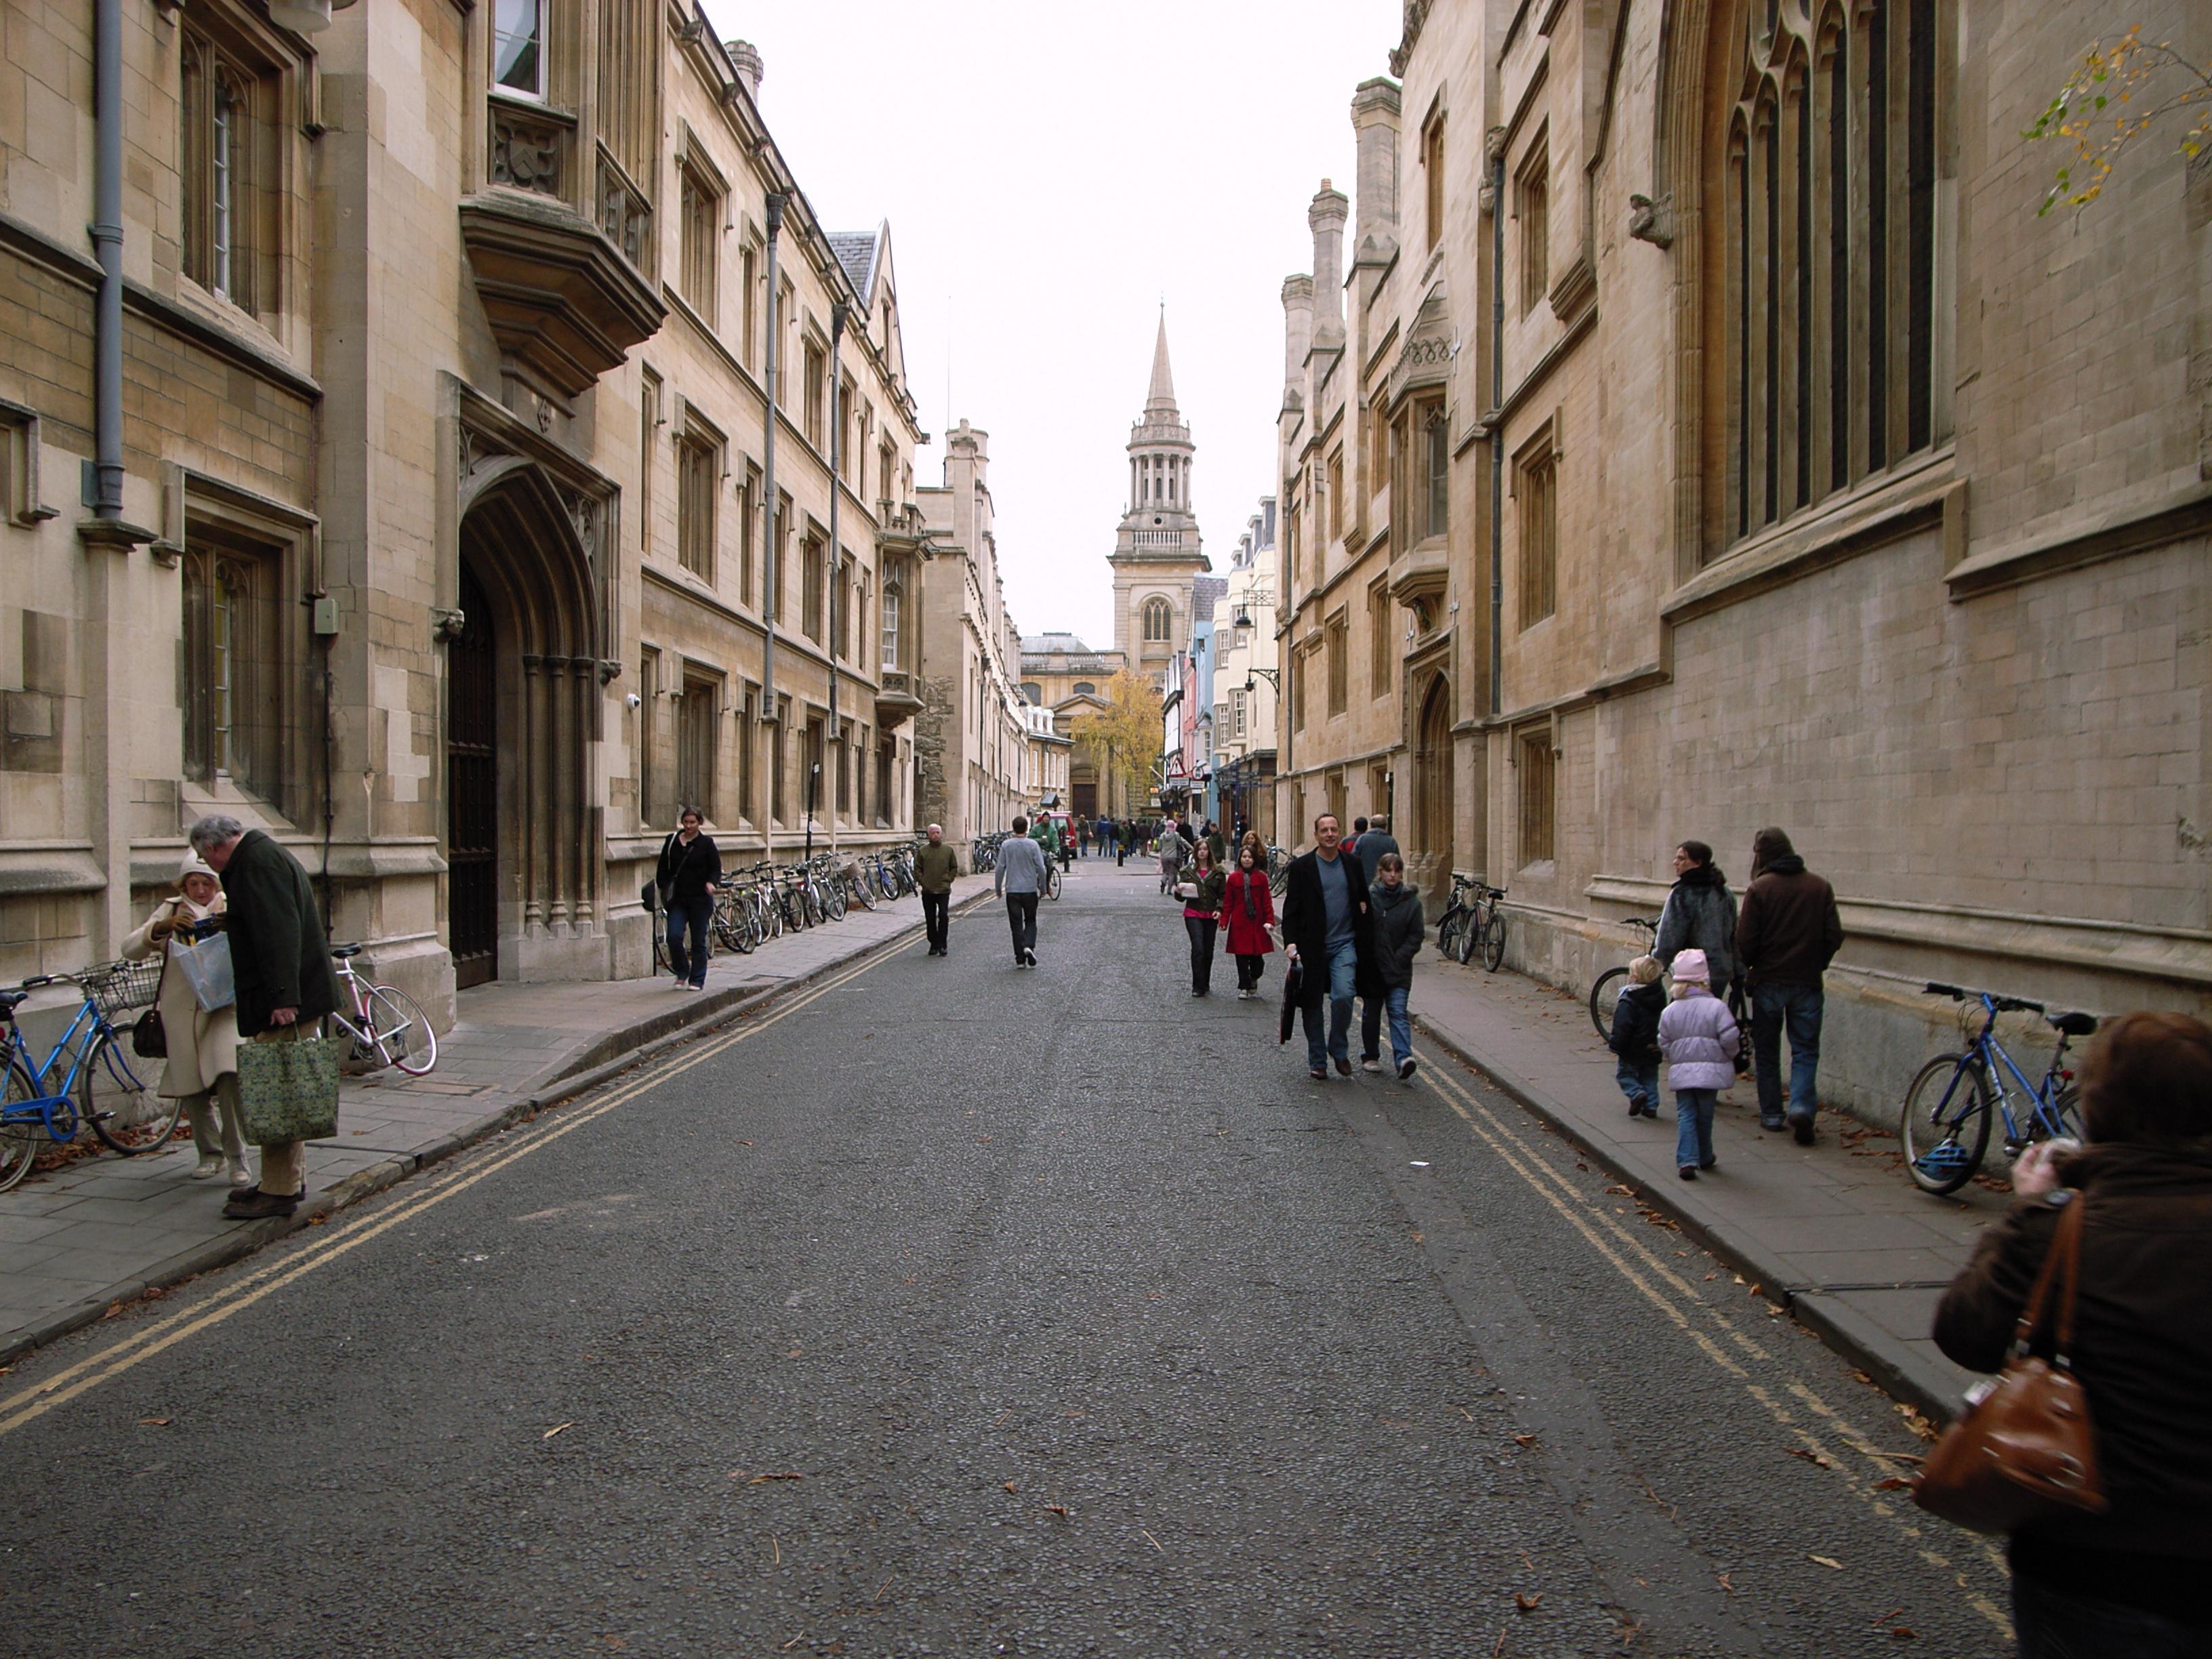 File:Turl Street, Oxford.jpg - Wikipedia, the free encyclopedia